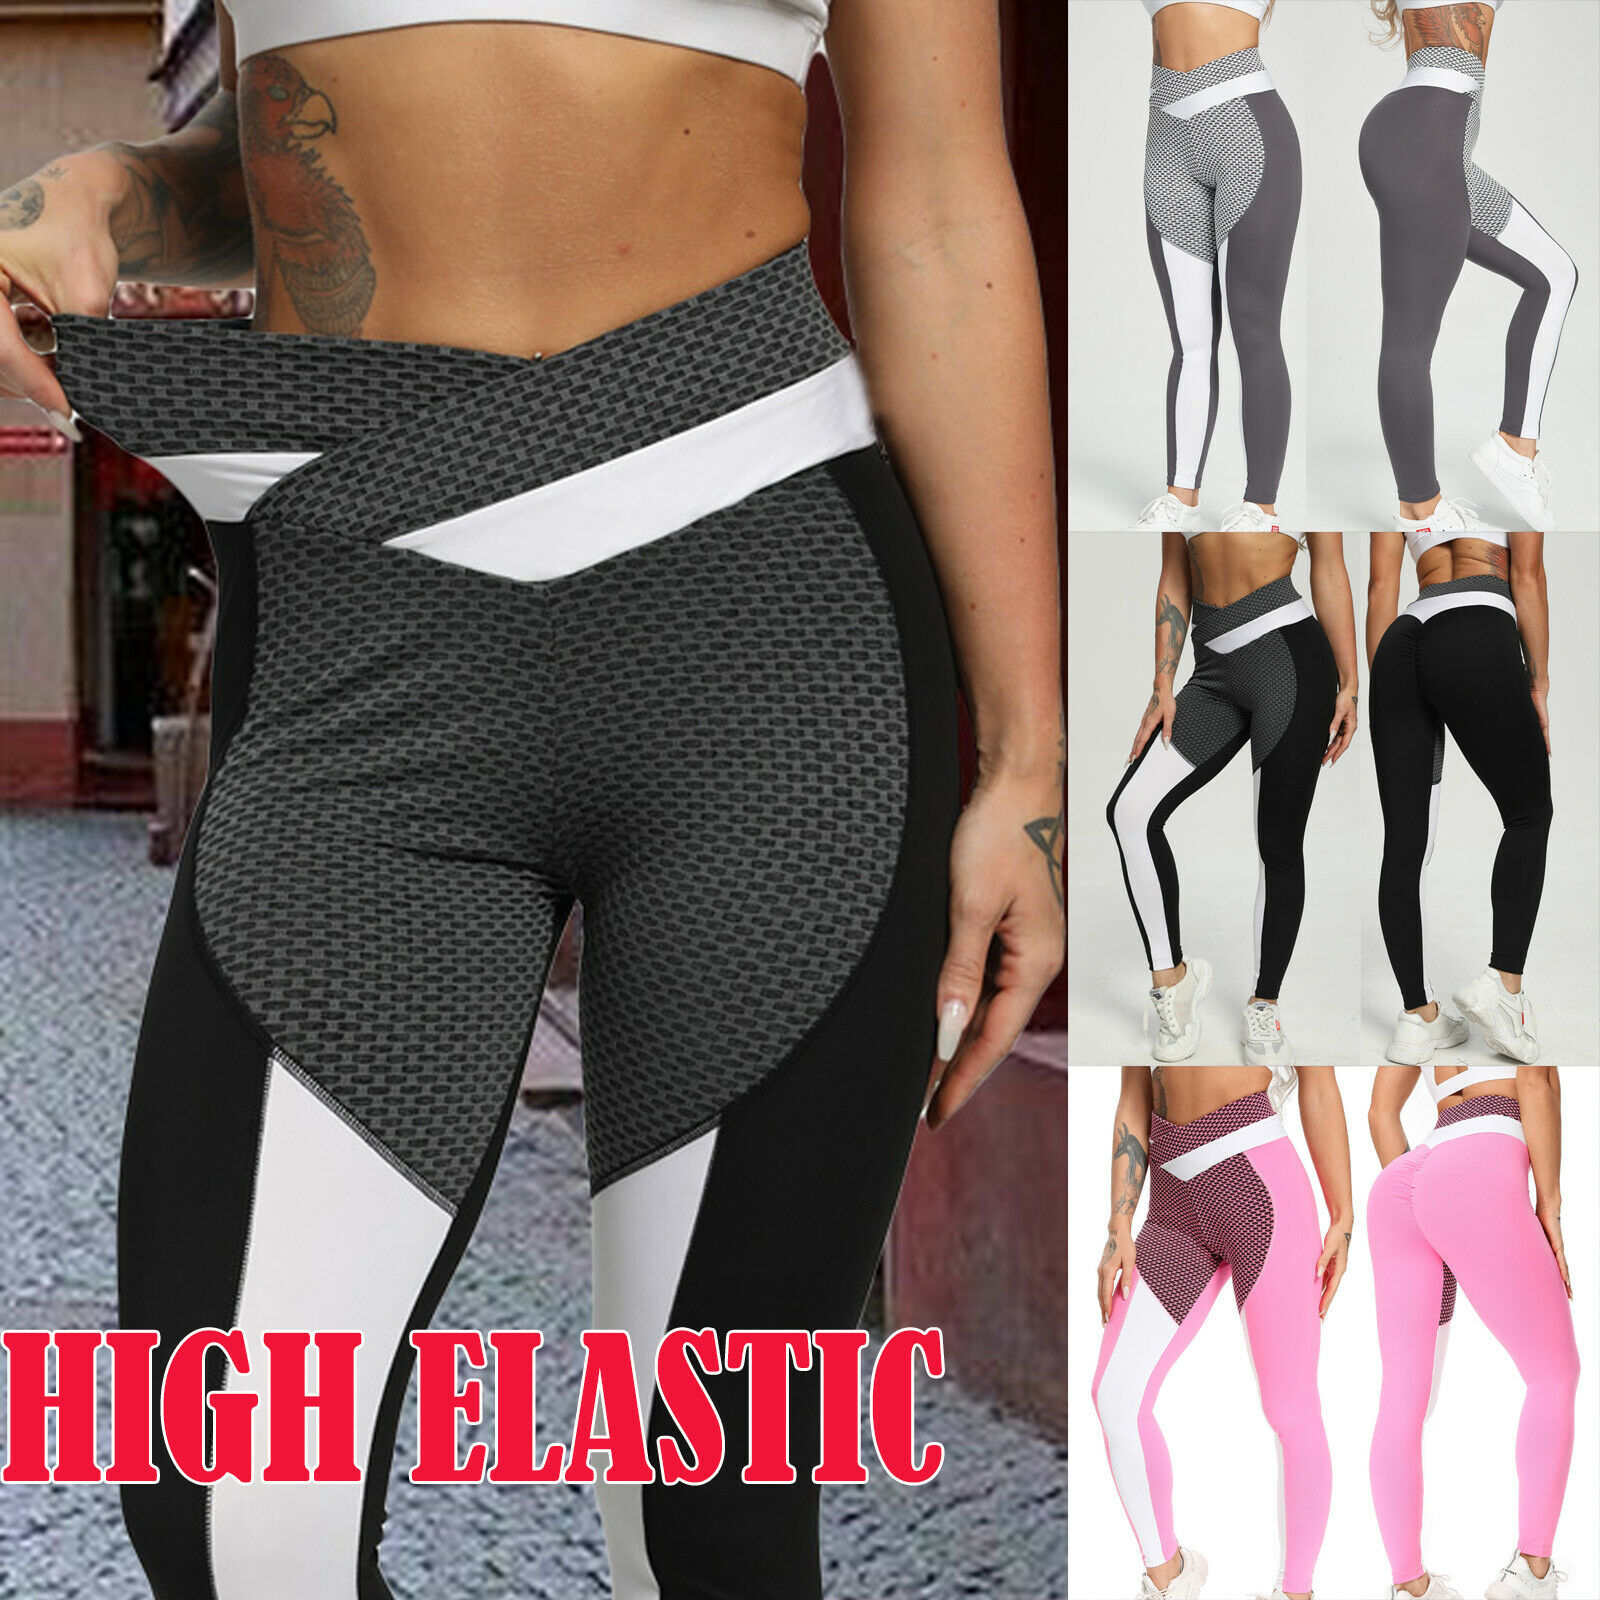 Tik Tok Women Anti Cellulite Compression Push Up Yoga Pants Fitness Leggings XL